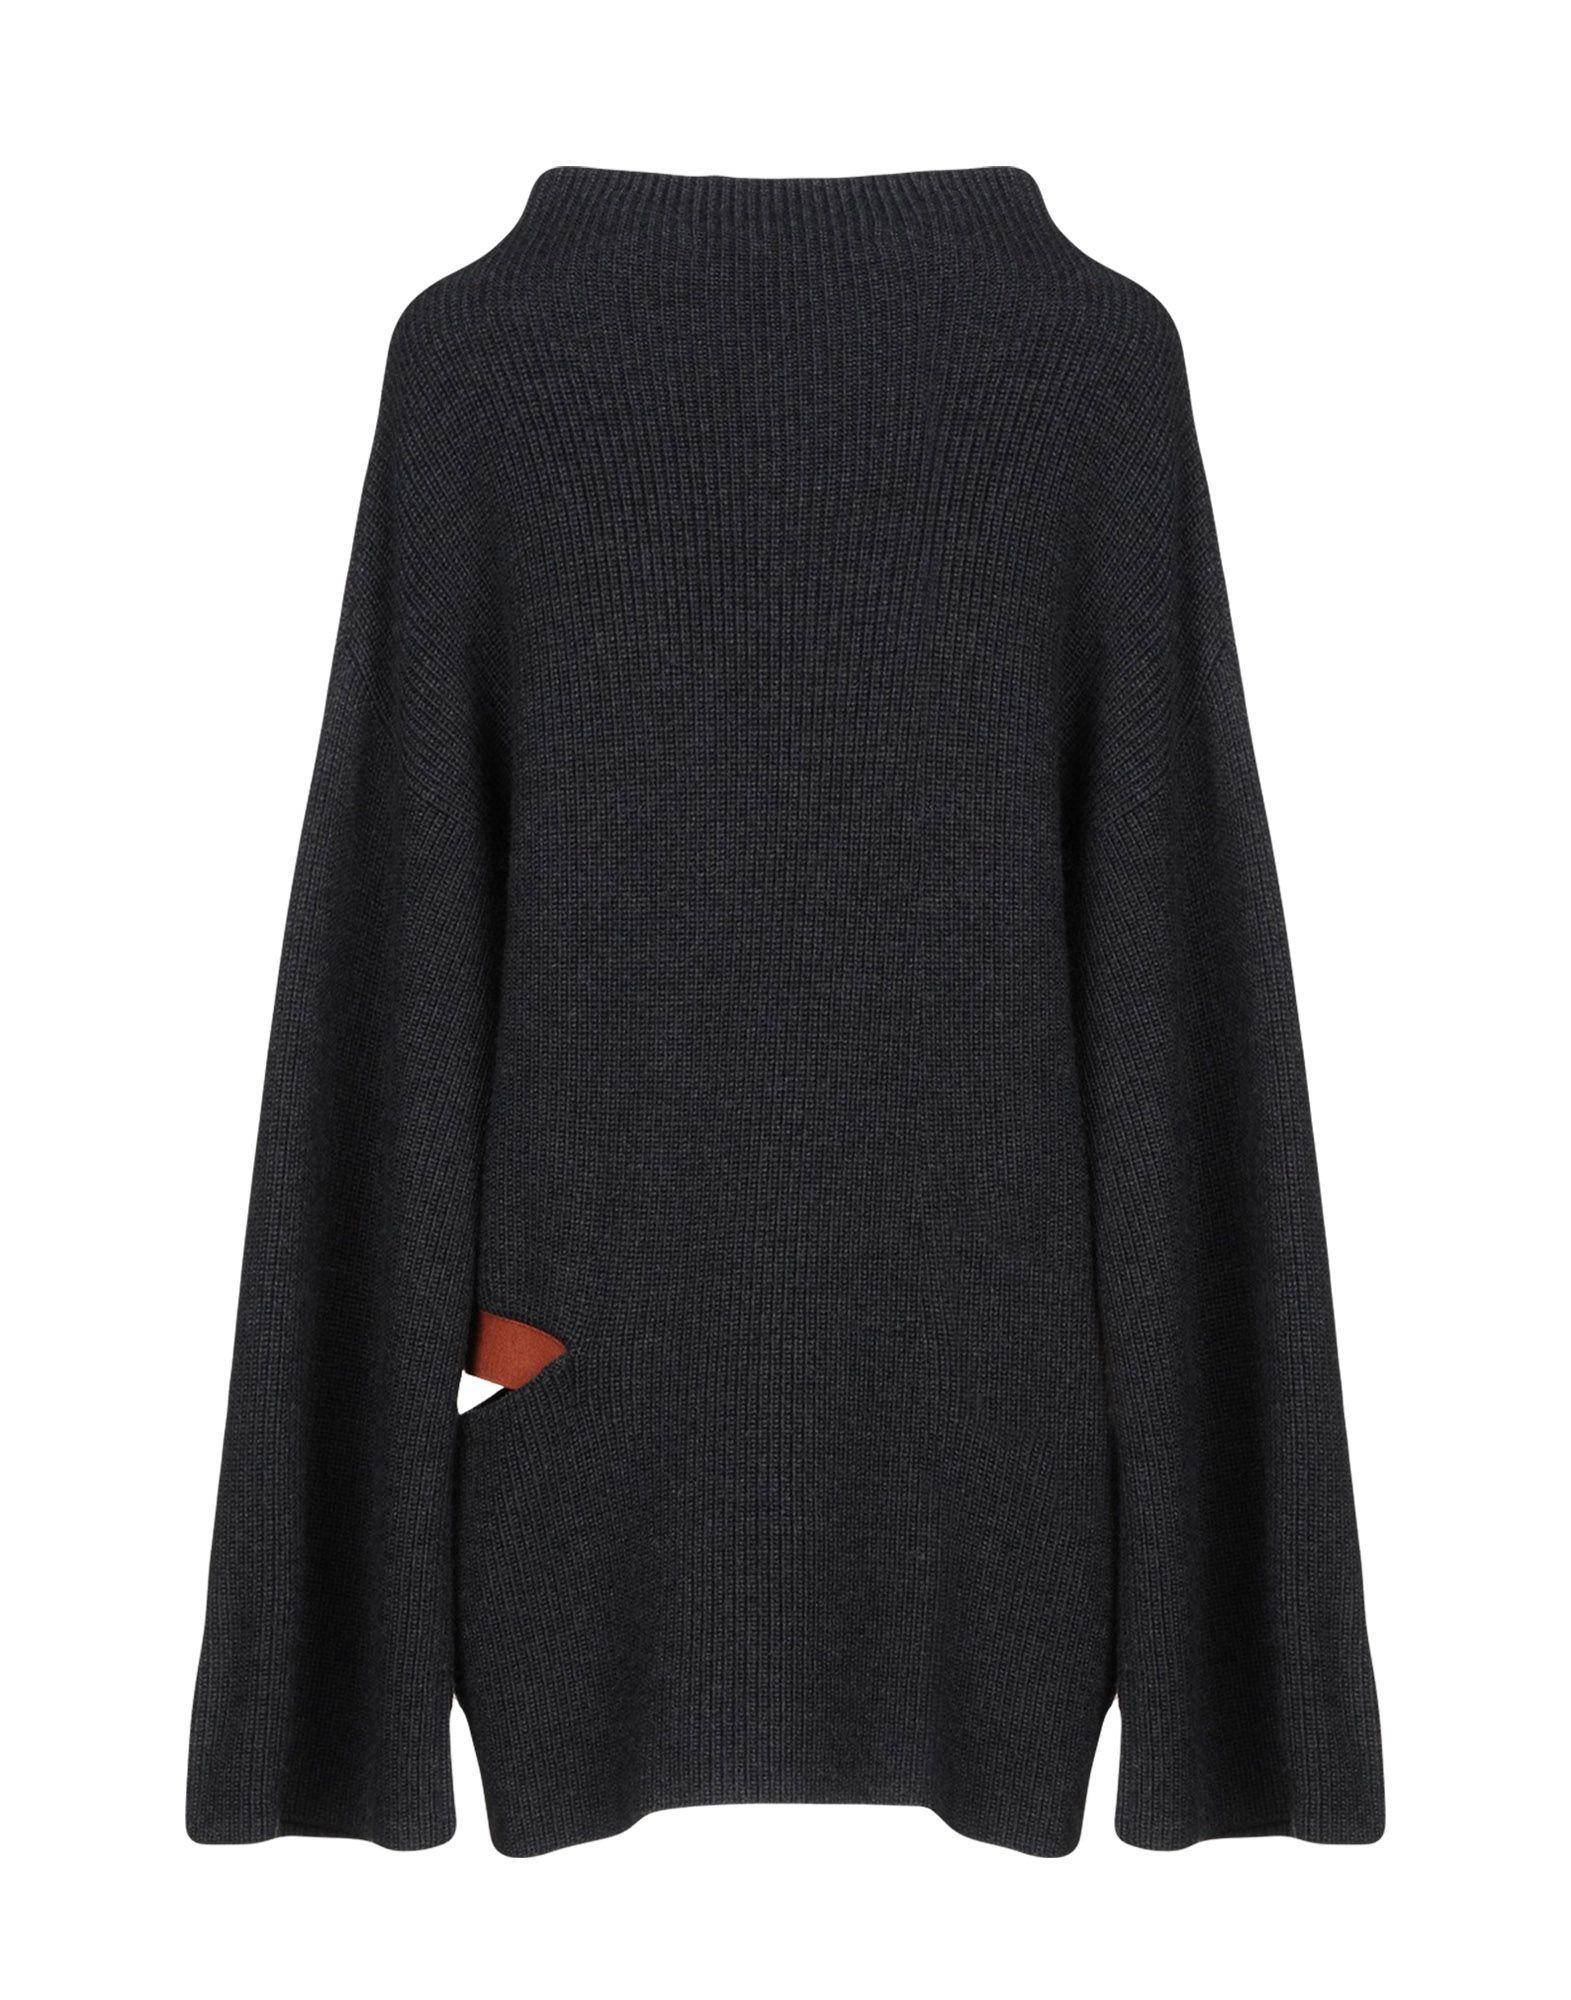 Minivestido Stella McCartney de Lana de color Negro